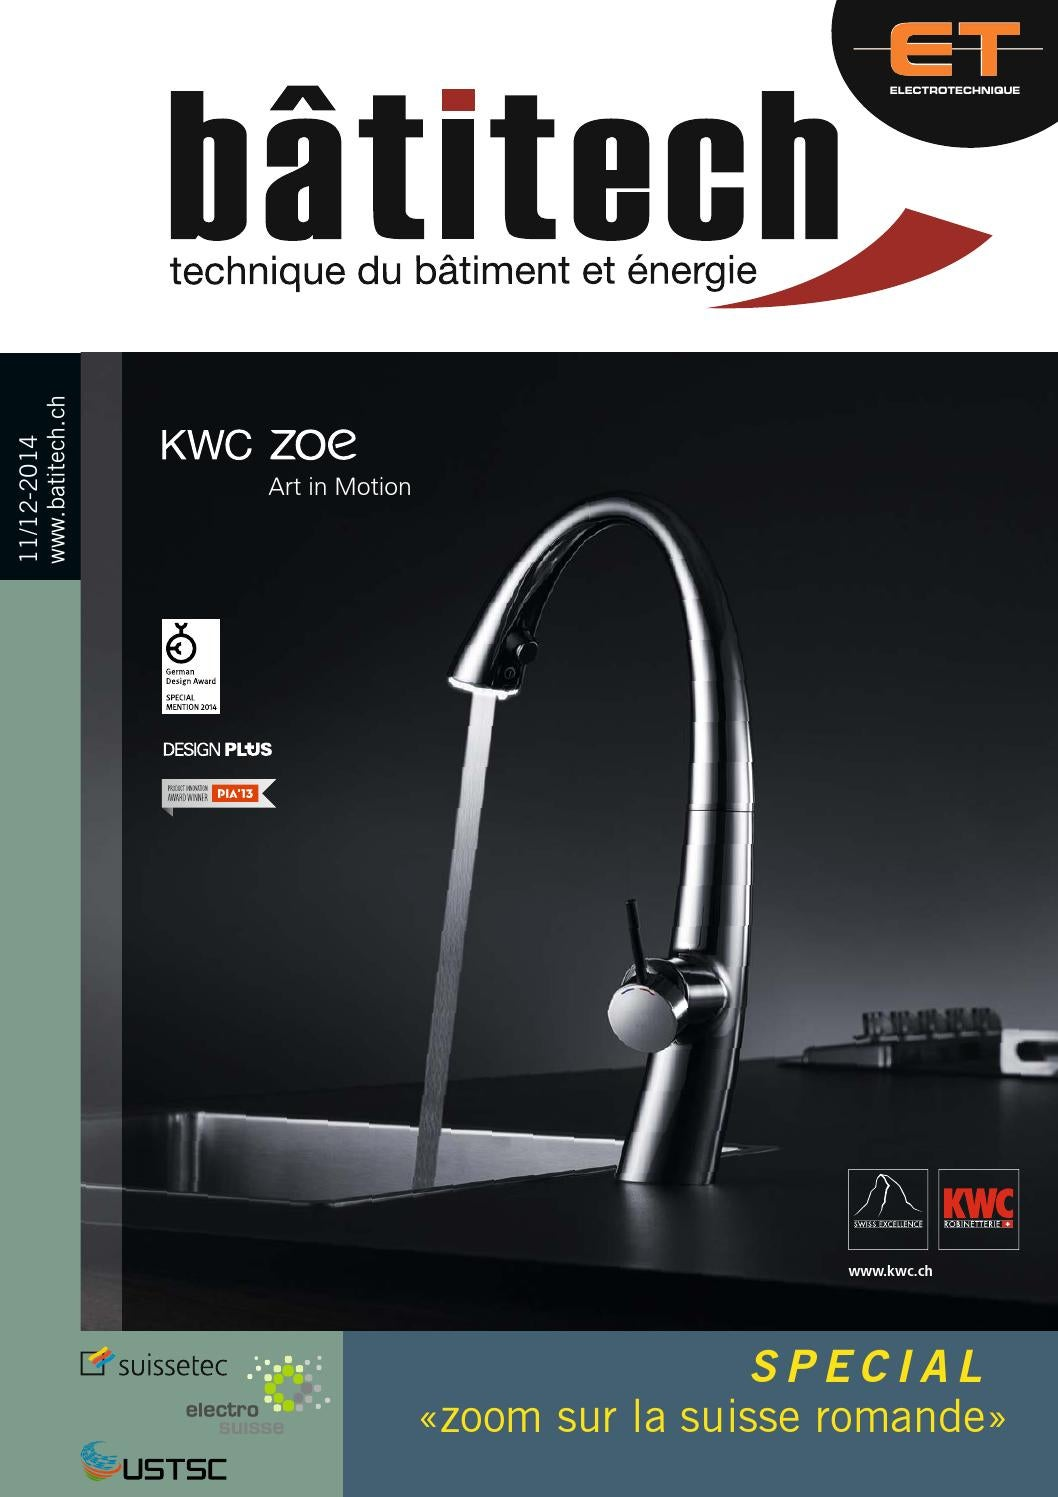 KPH-1500 Classic Chauffe-socle de cuisine Chauffage central 1,5 kW Hydronique